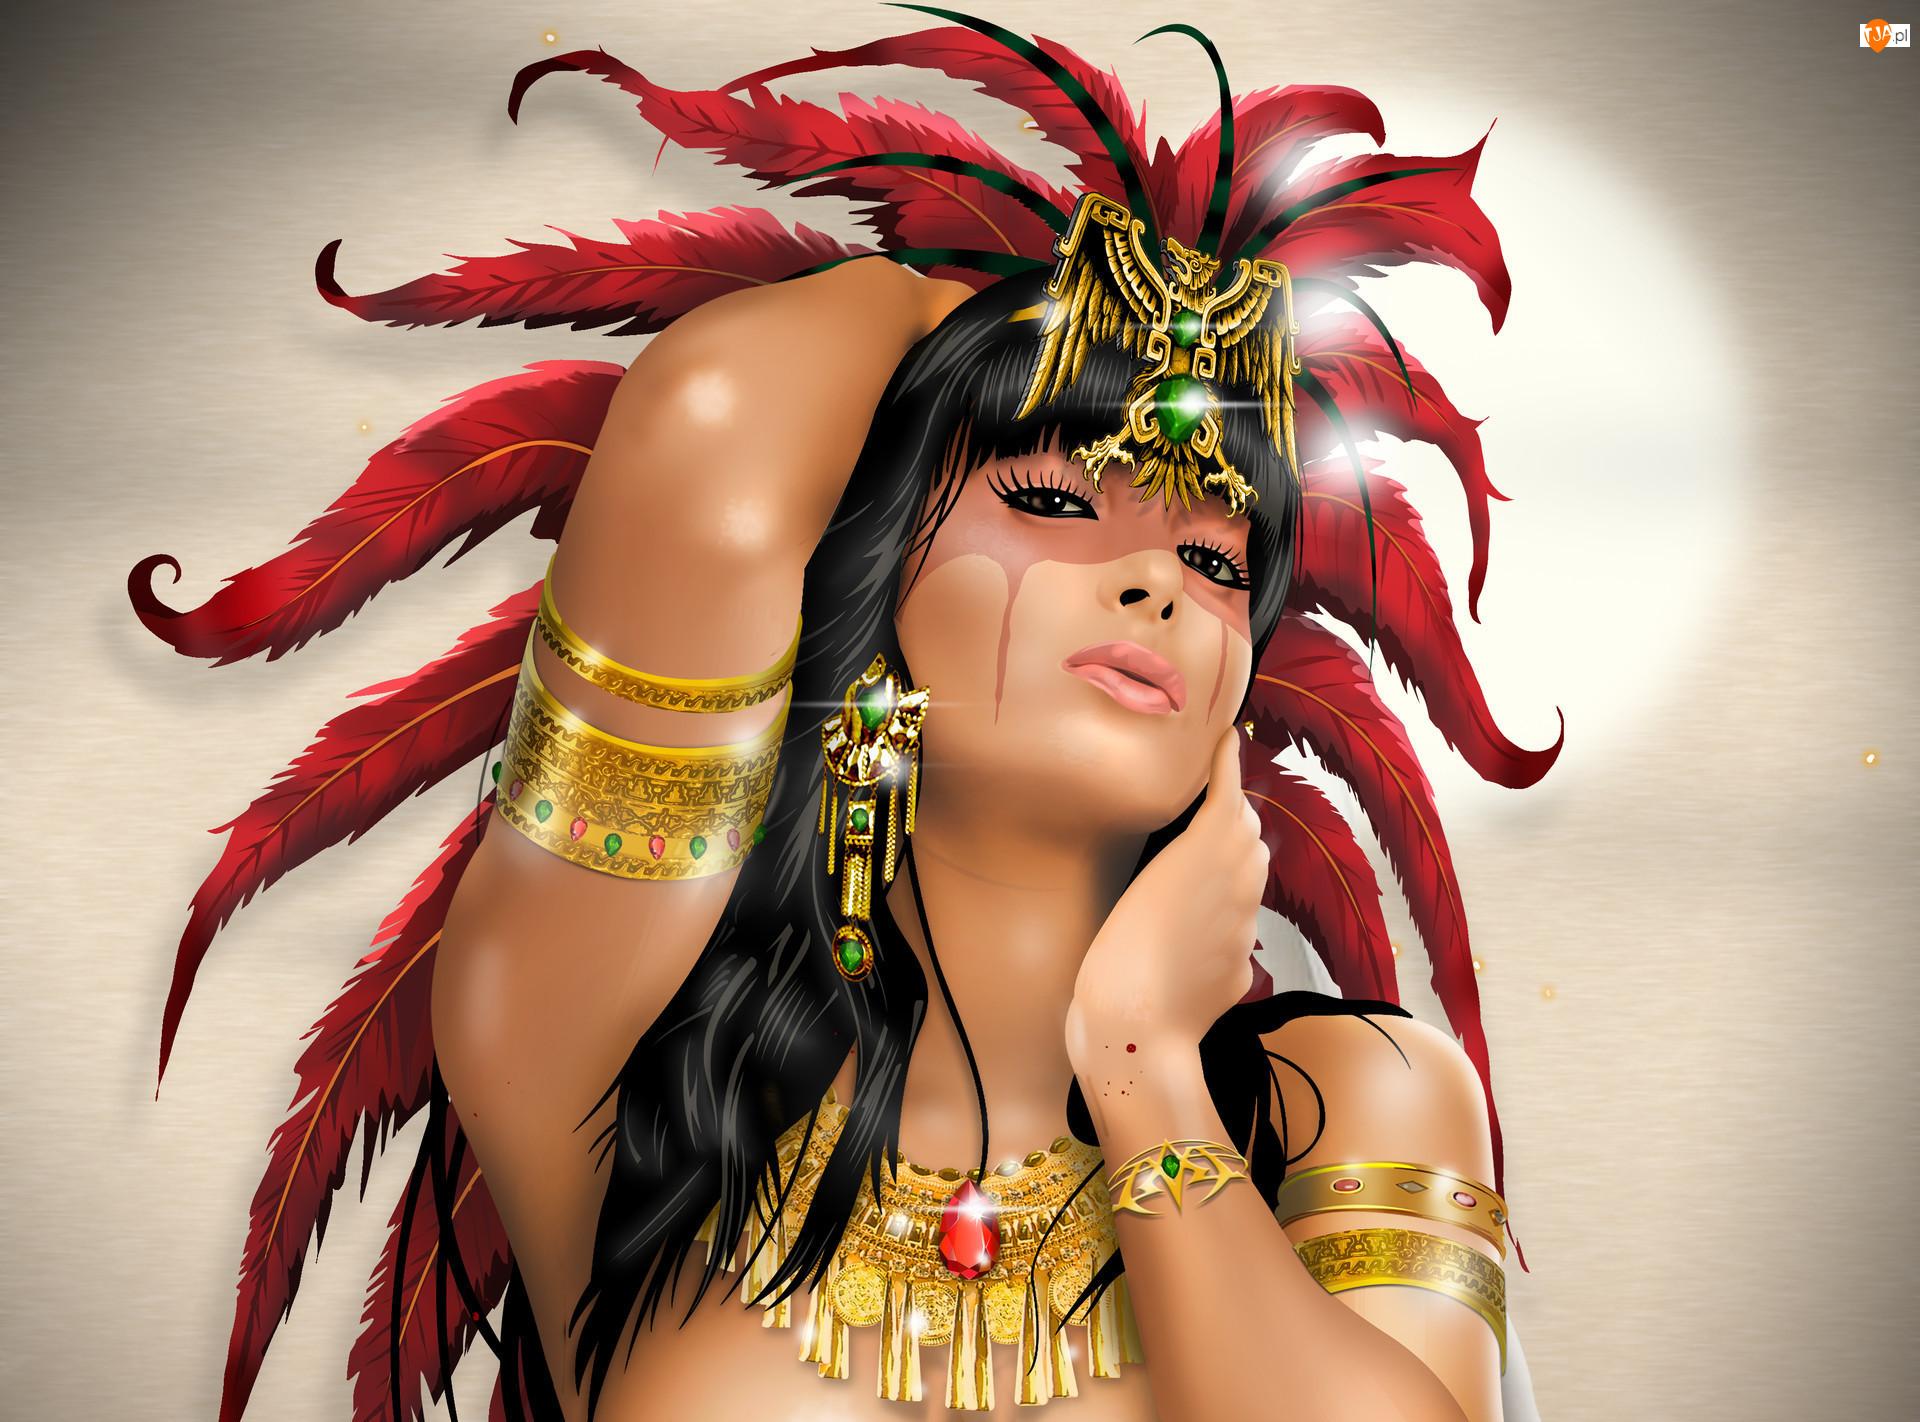 Kobieta, Grafika 3D, Pióropusz, Biżuteria